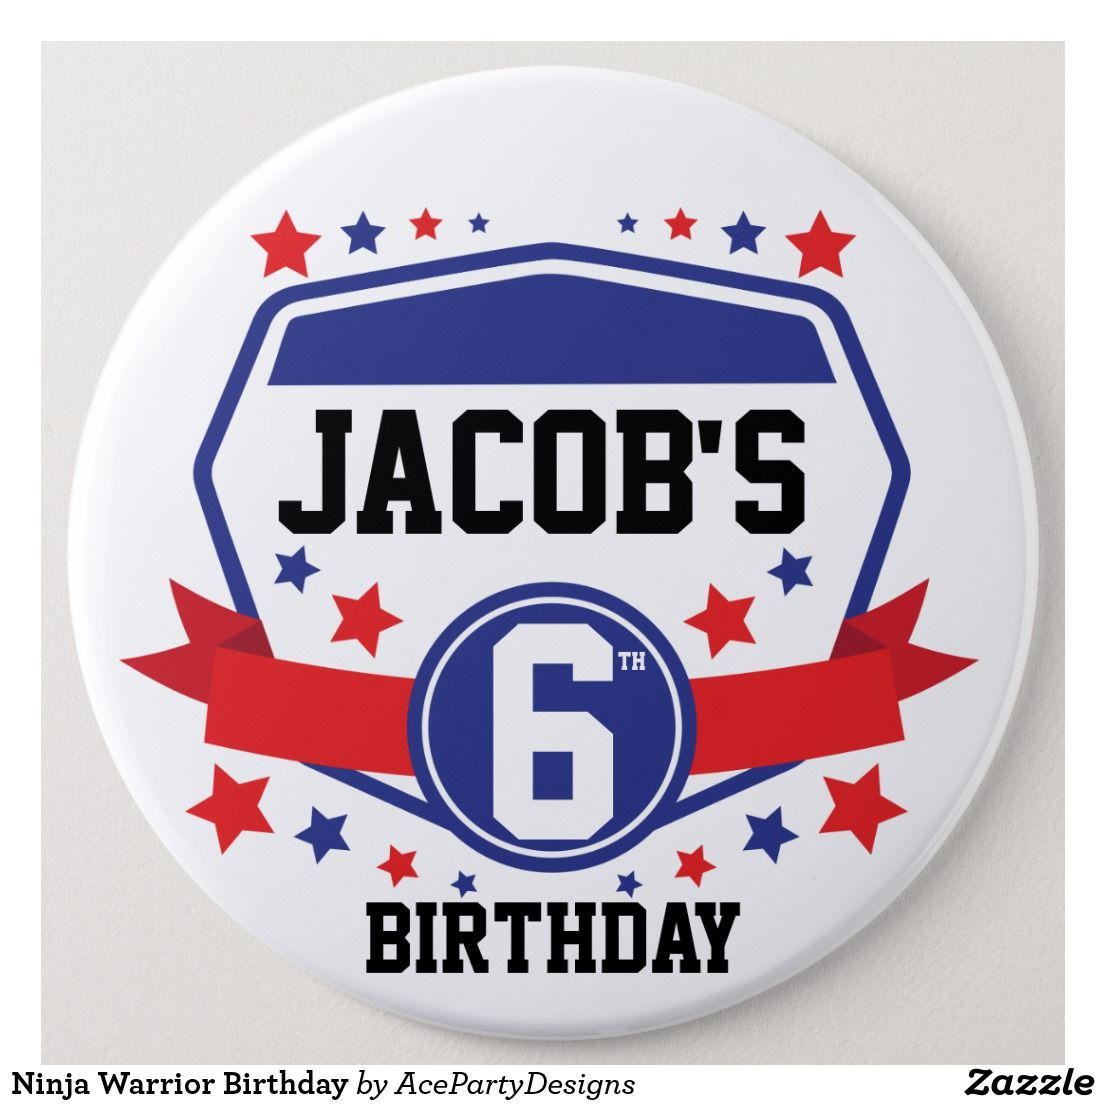 Ninja Warrior Birthday 6 Cm Round Badge Zazzle Com Au Ninja Warrior Birthday Party Themes Boy Birthday